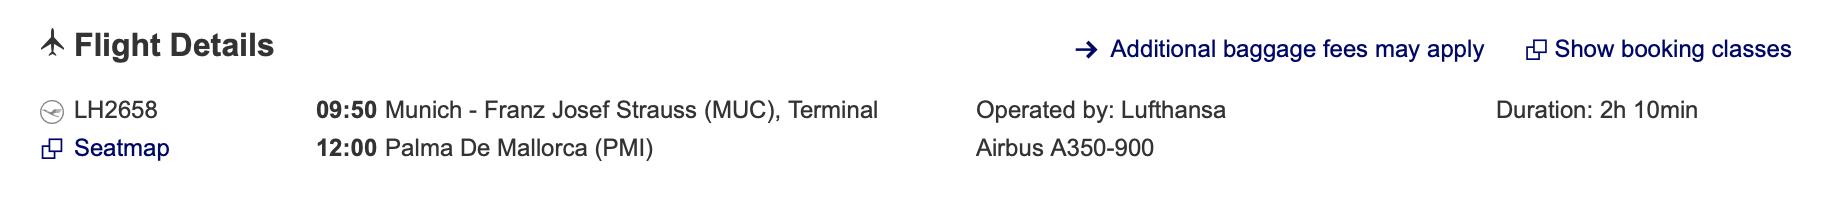 Munich to Mallorca Lufthansa flight details